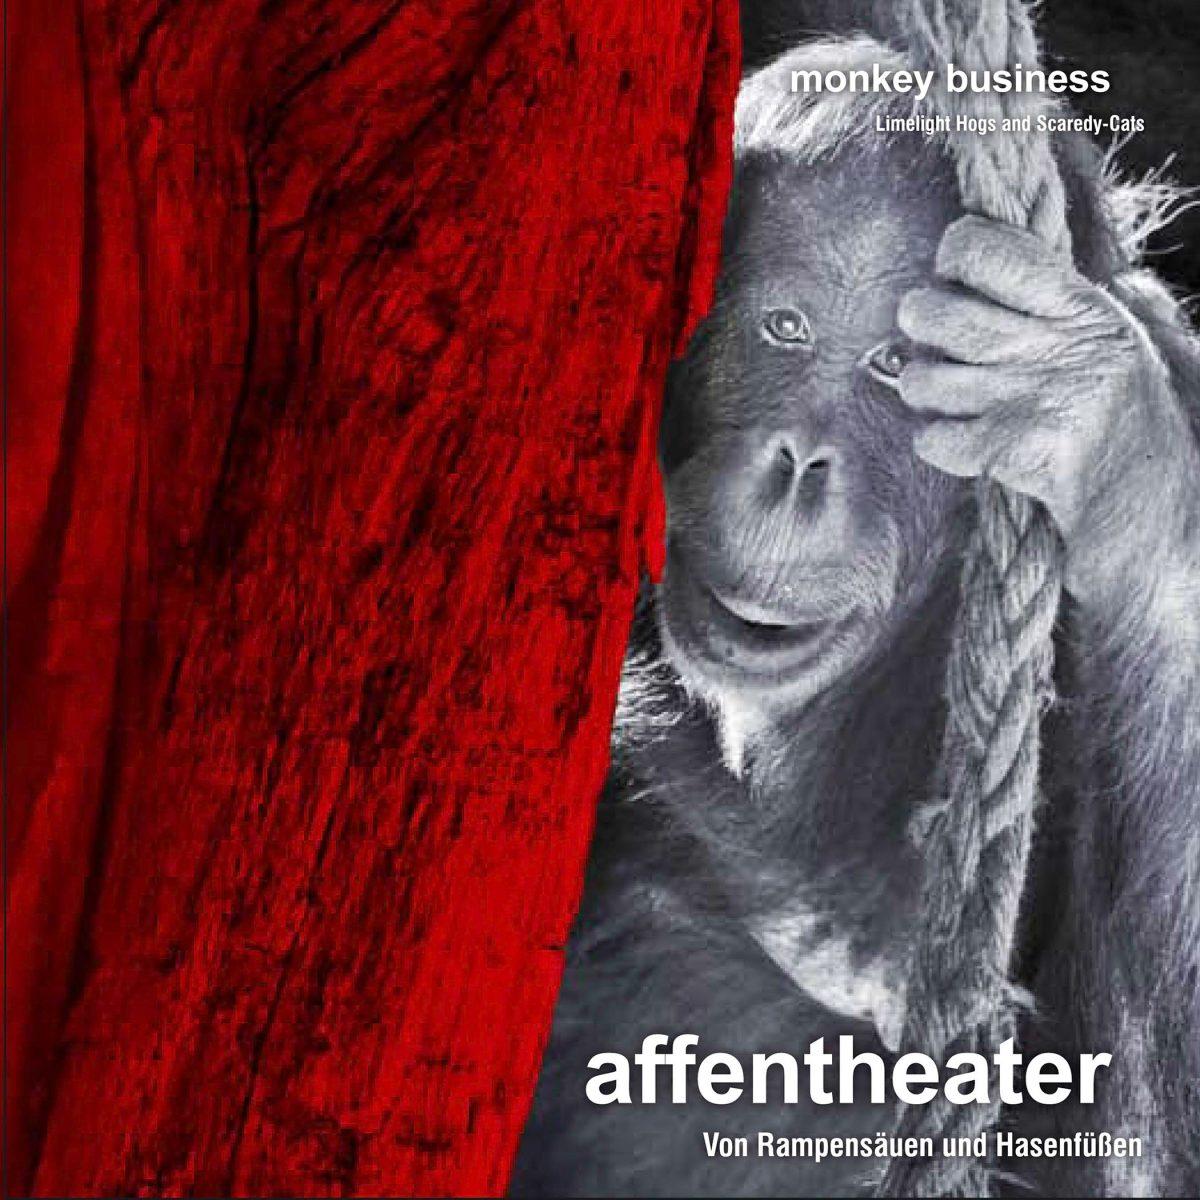 affentheater- Auszüge auf Isuu.com